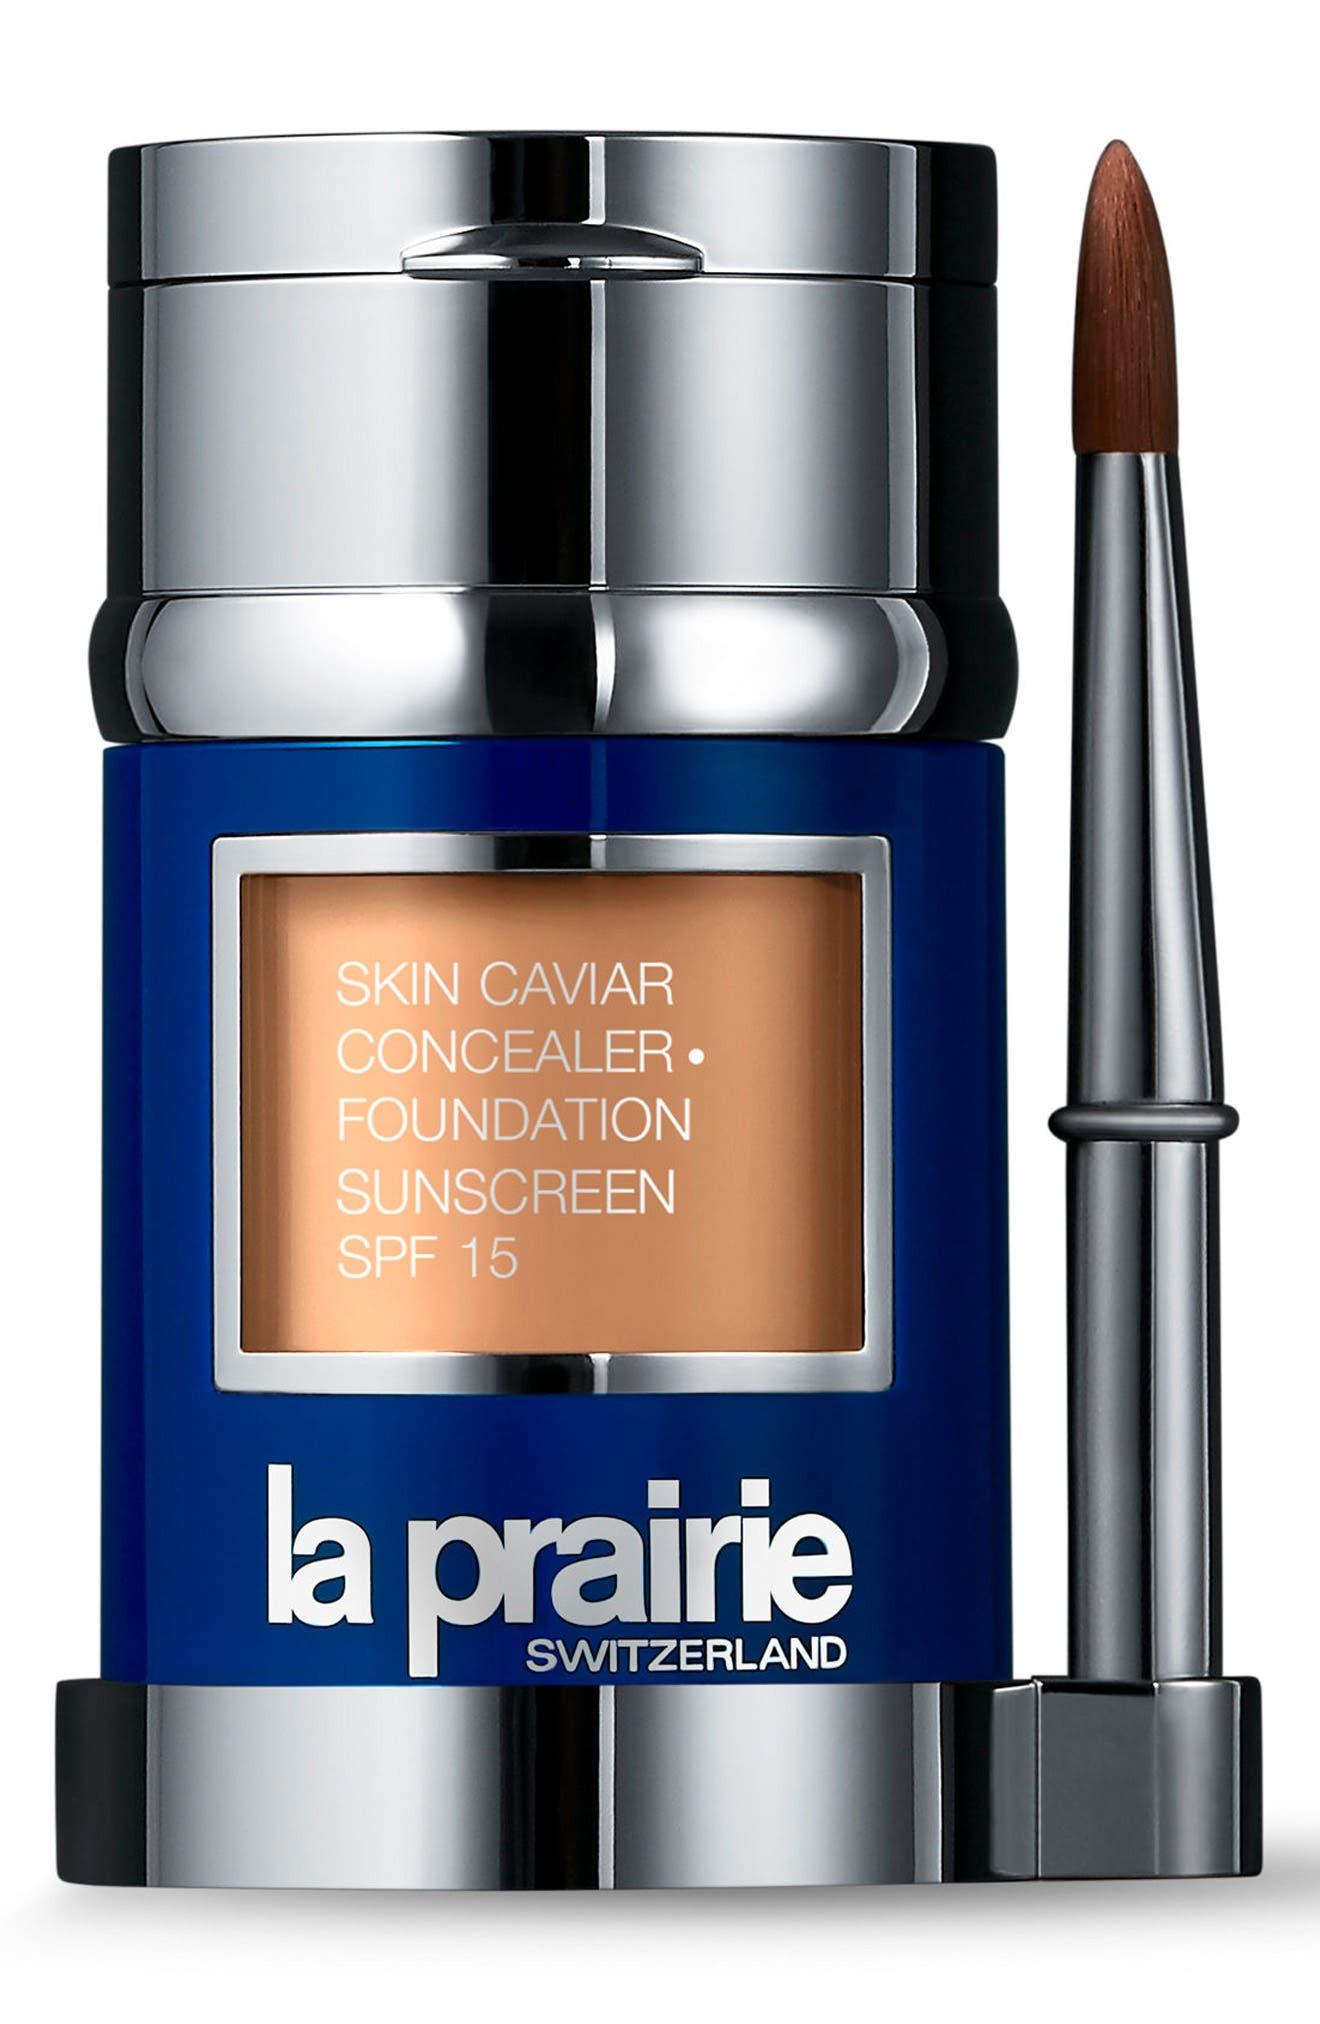 La Prairie Skin Caviar Concealer + Foundation Sunscreen SPF 15